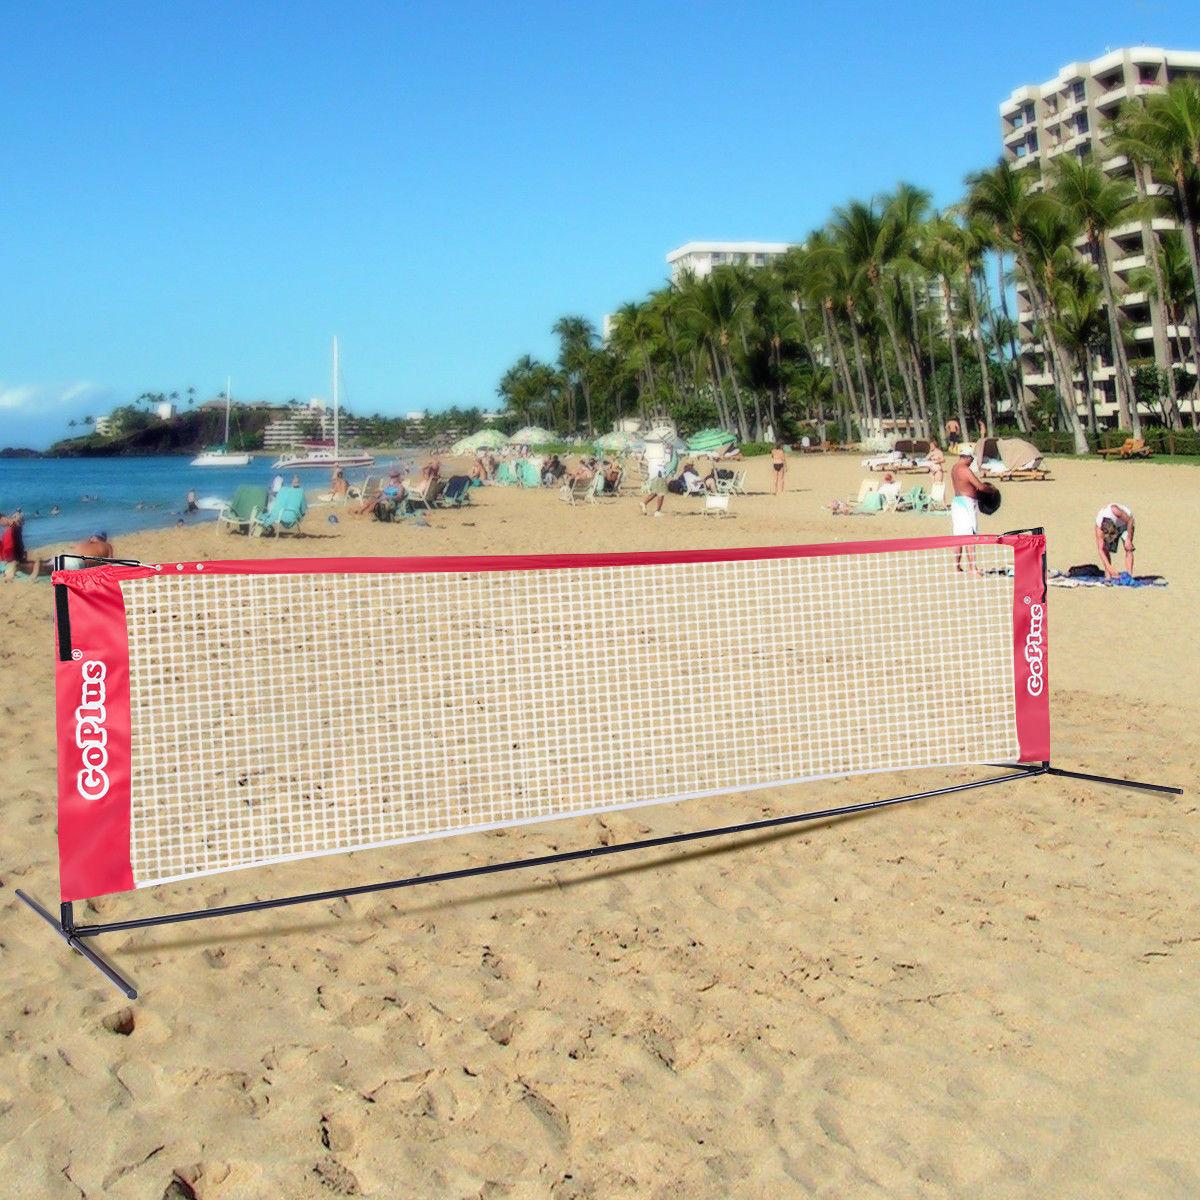 Goplus 10' Mini Portable Tennis Net Training Sports In/Outdoor w/ Carrying Bag